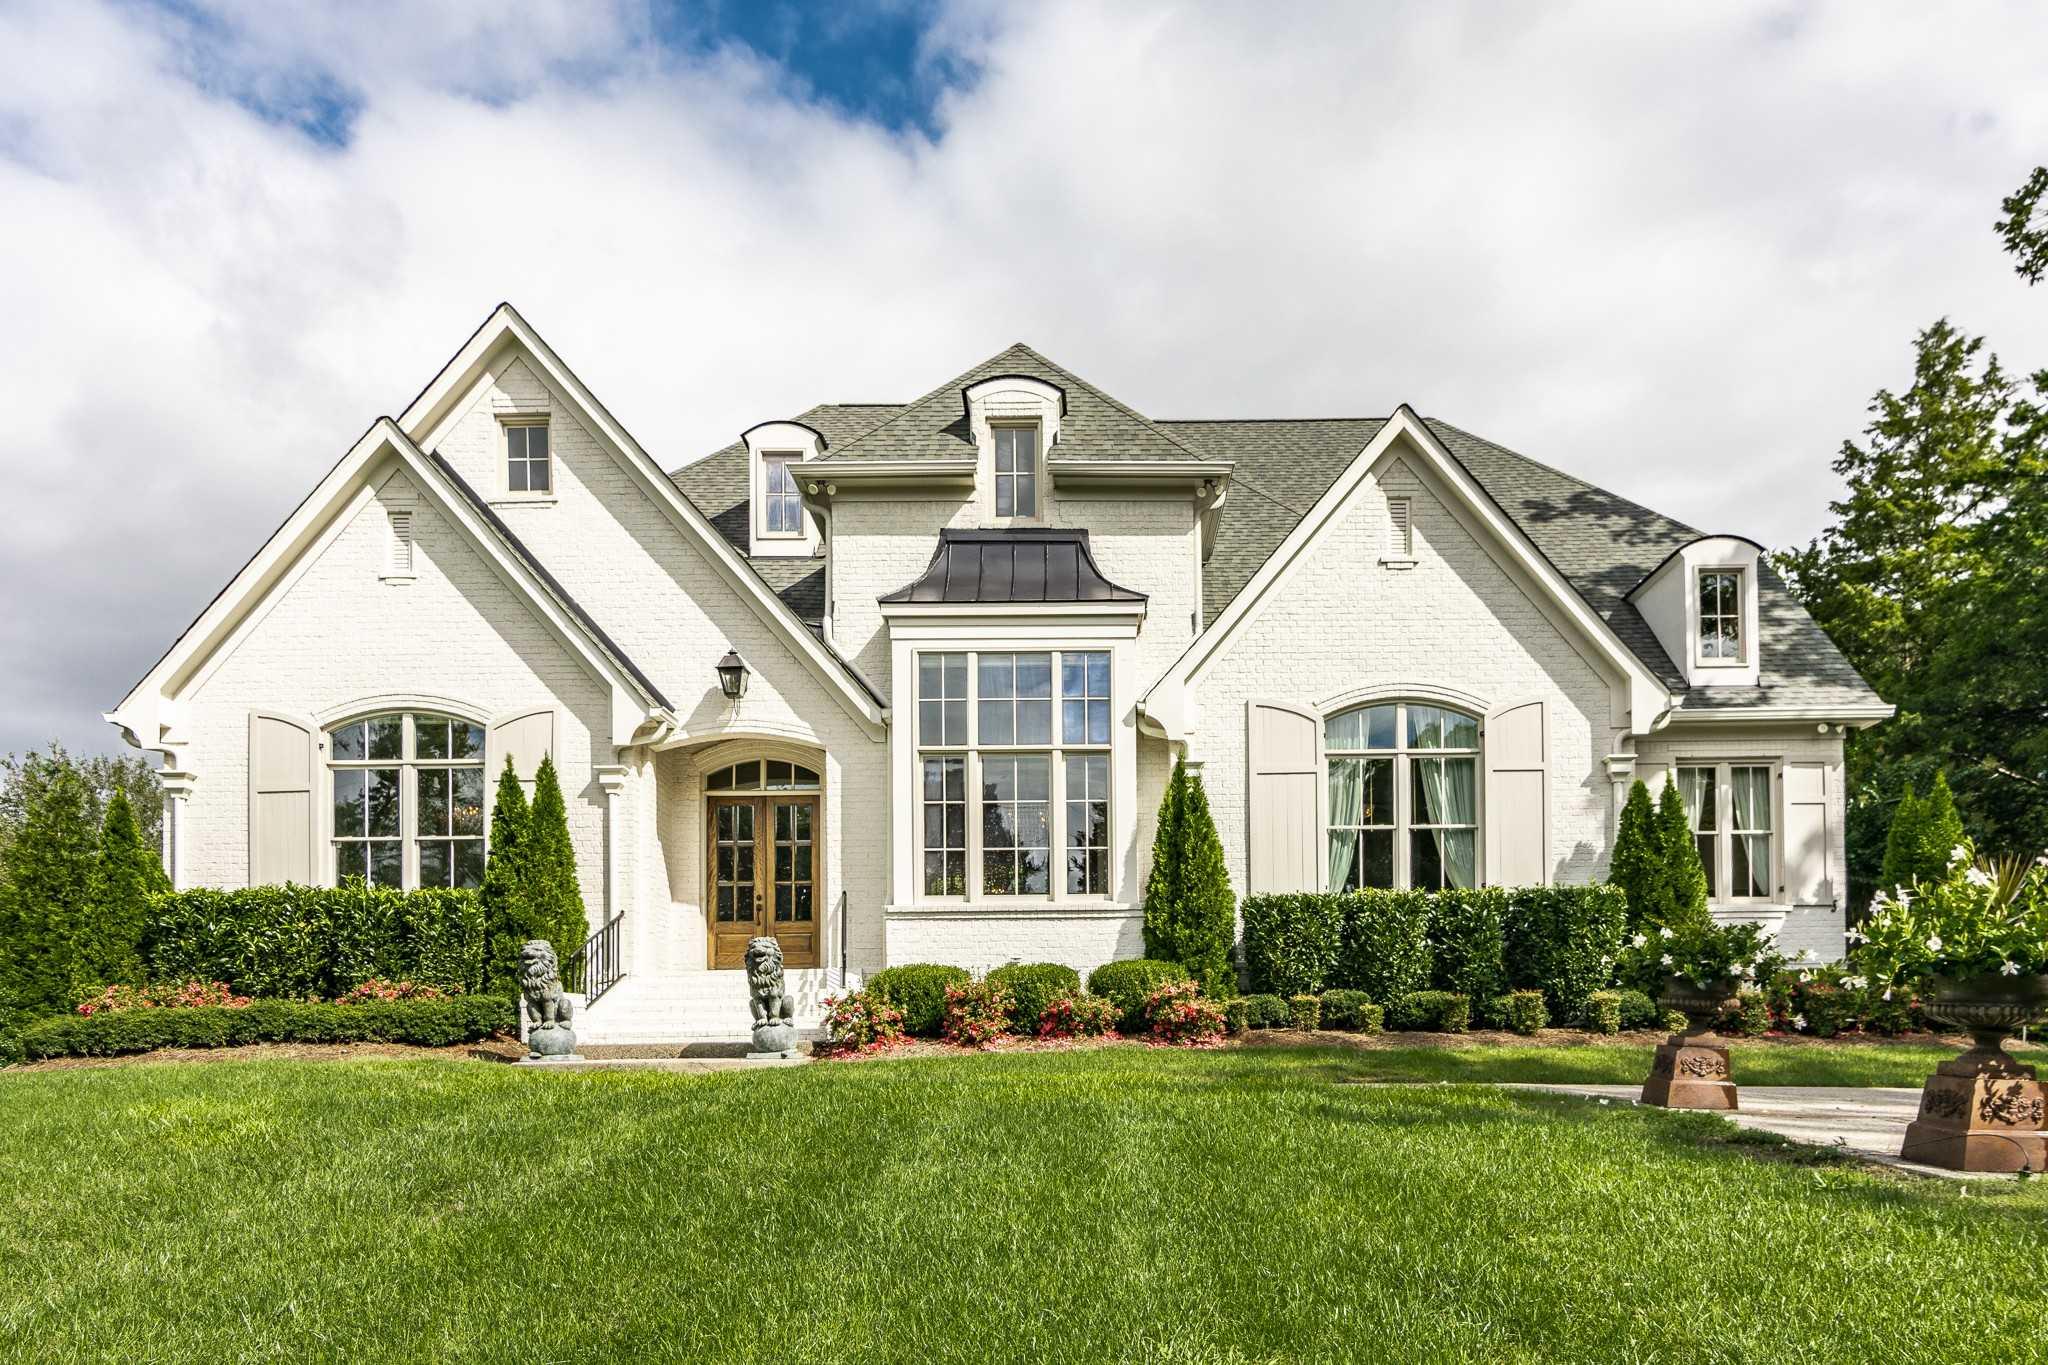 $3,400,000 - 6Br/7Ba -  for Sale in Sheriffs Estate, Brentwood